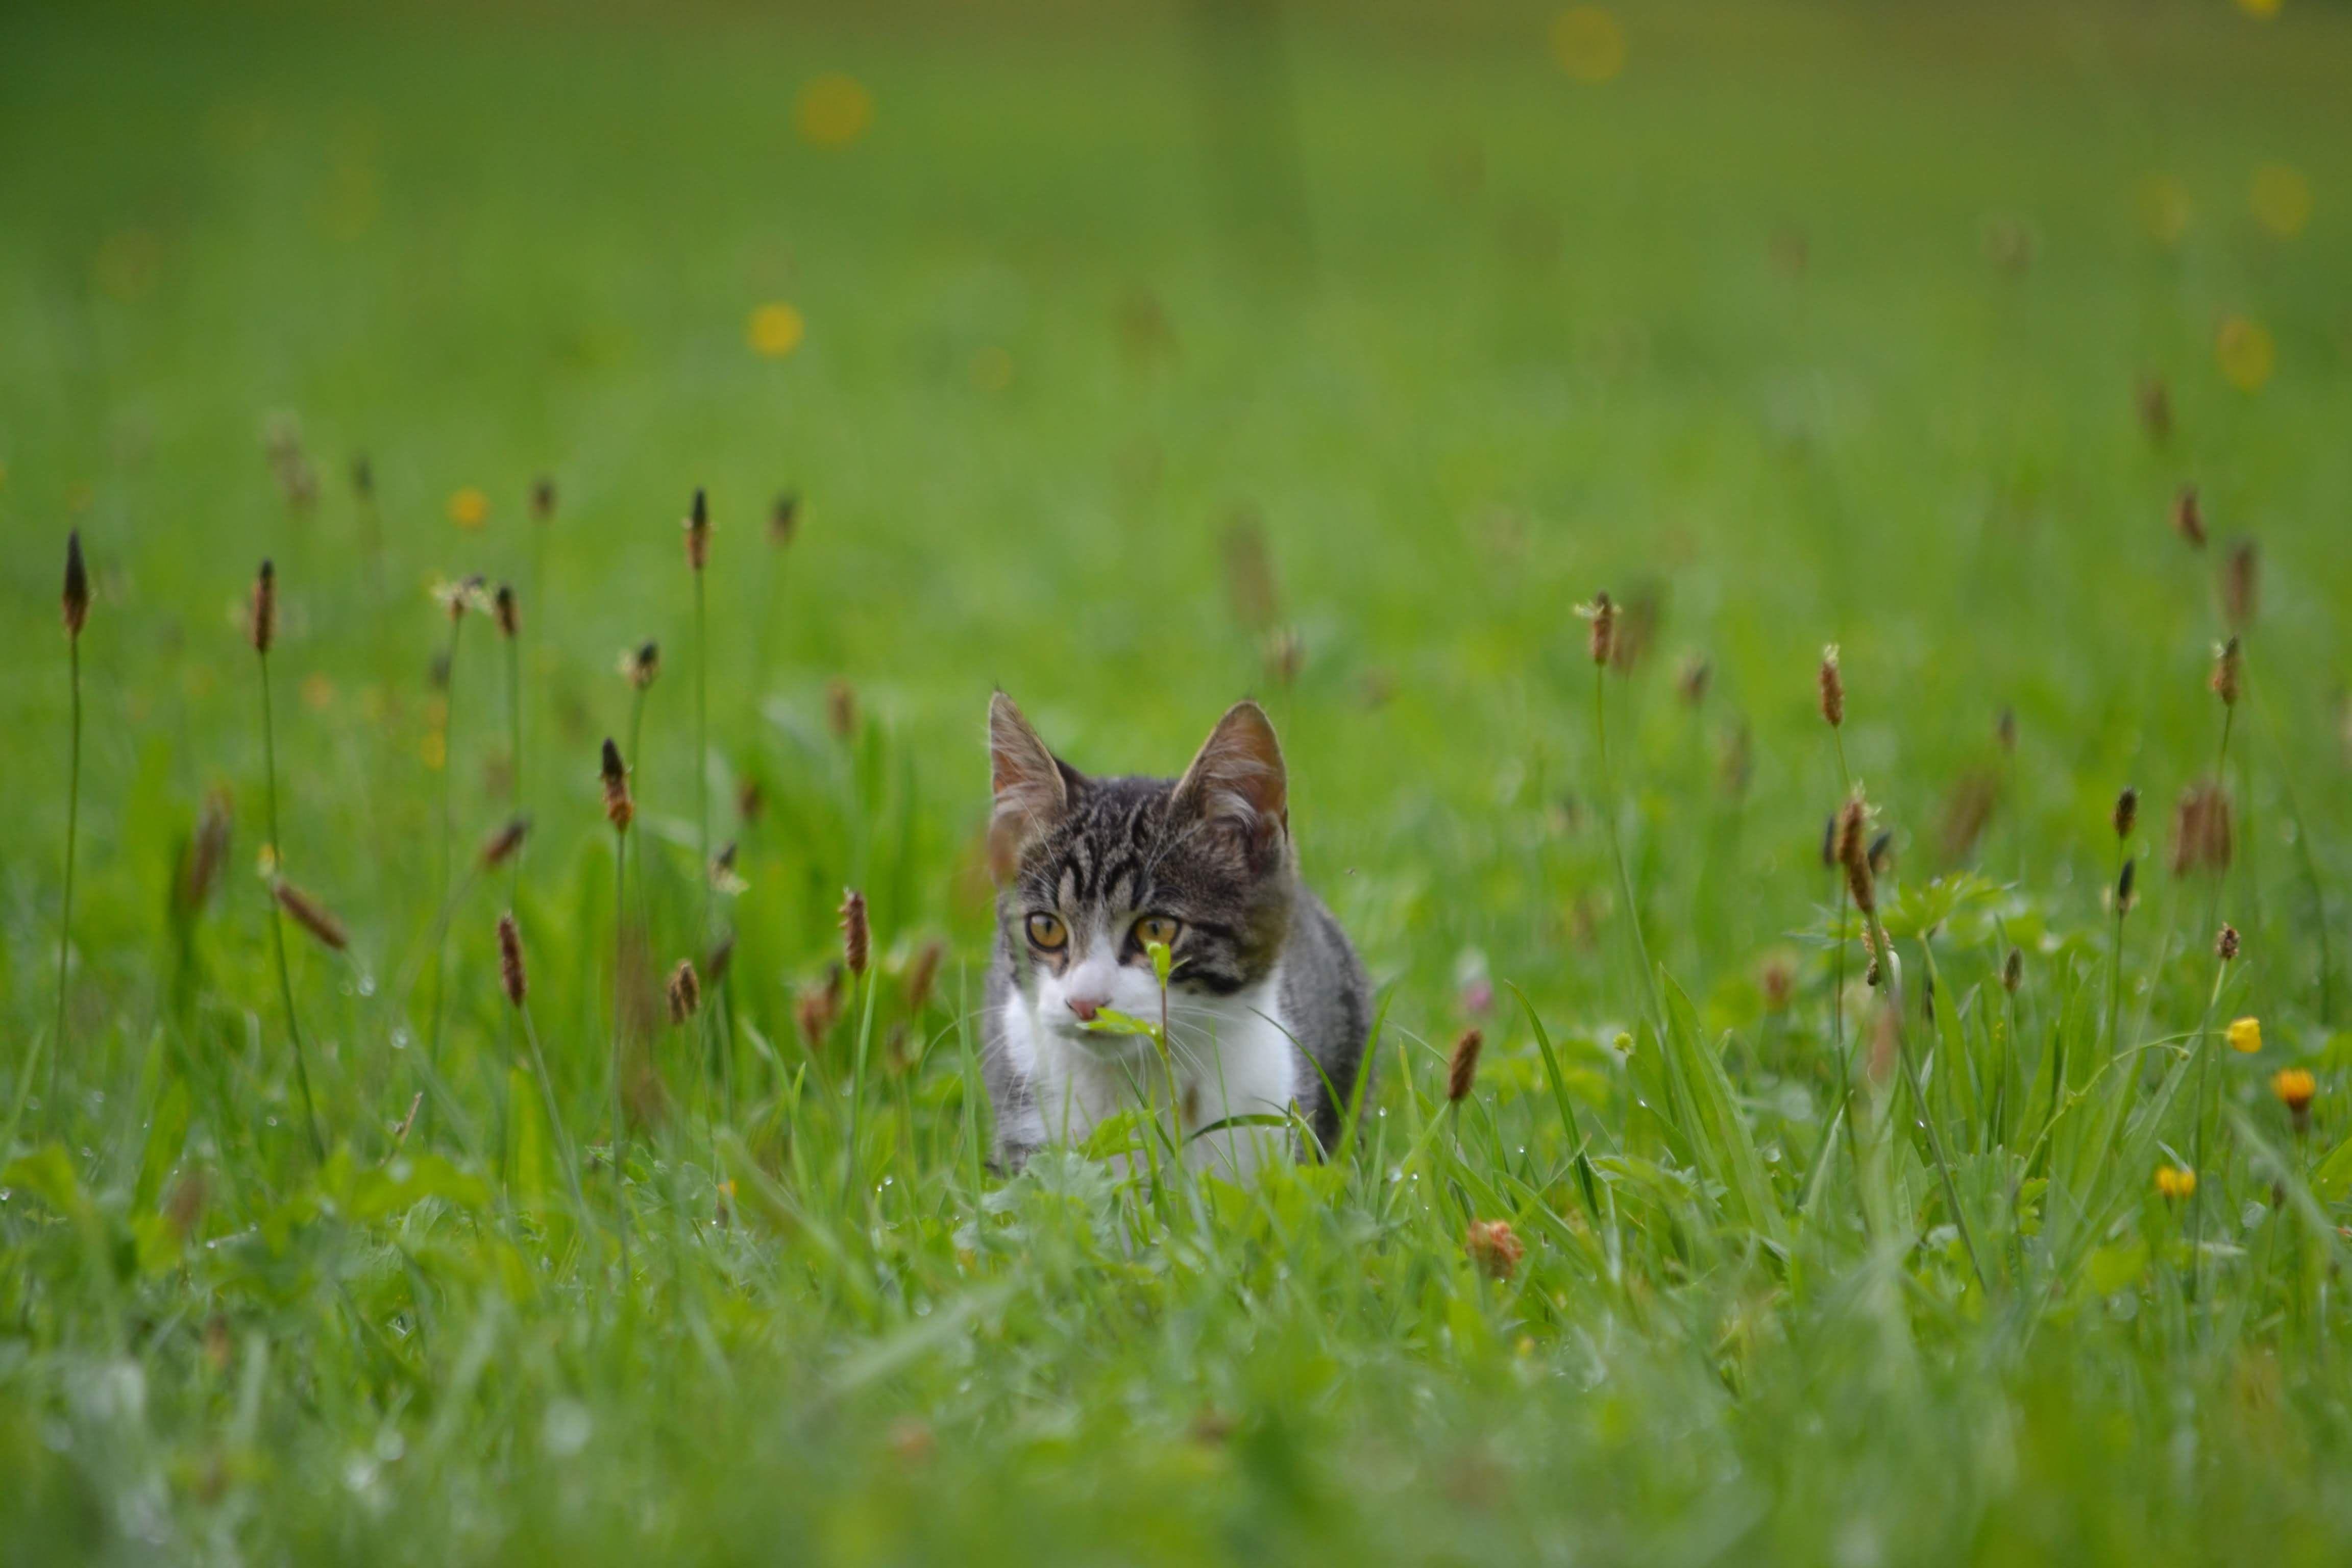 Grass Plant Mammal Silver Tabby Kitten Silver Tabby Kitten On Grass Field Tabby Kitten Silver Tabby Kitten Kittens